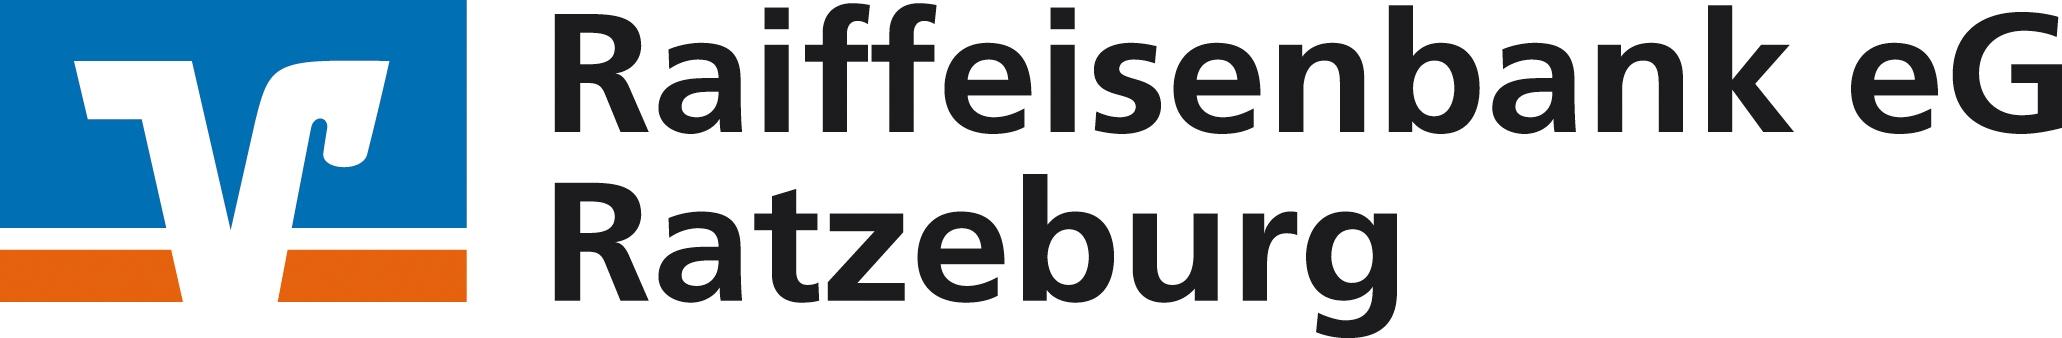 Raiffeisenbank eG Ratzeburg